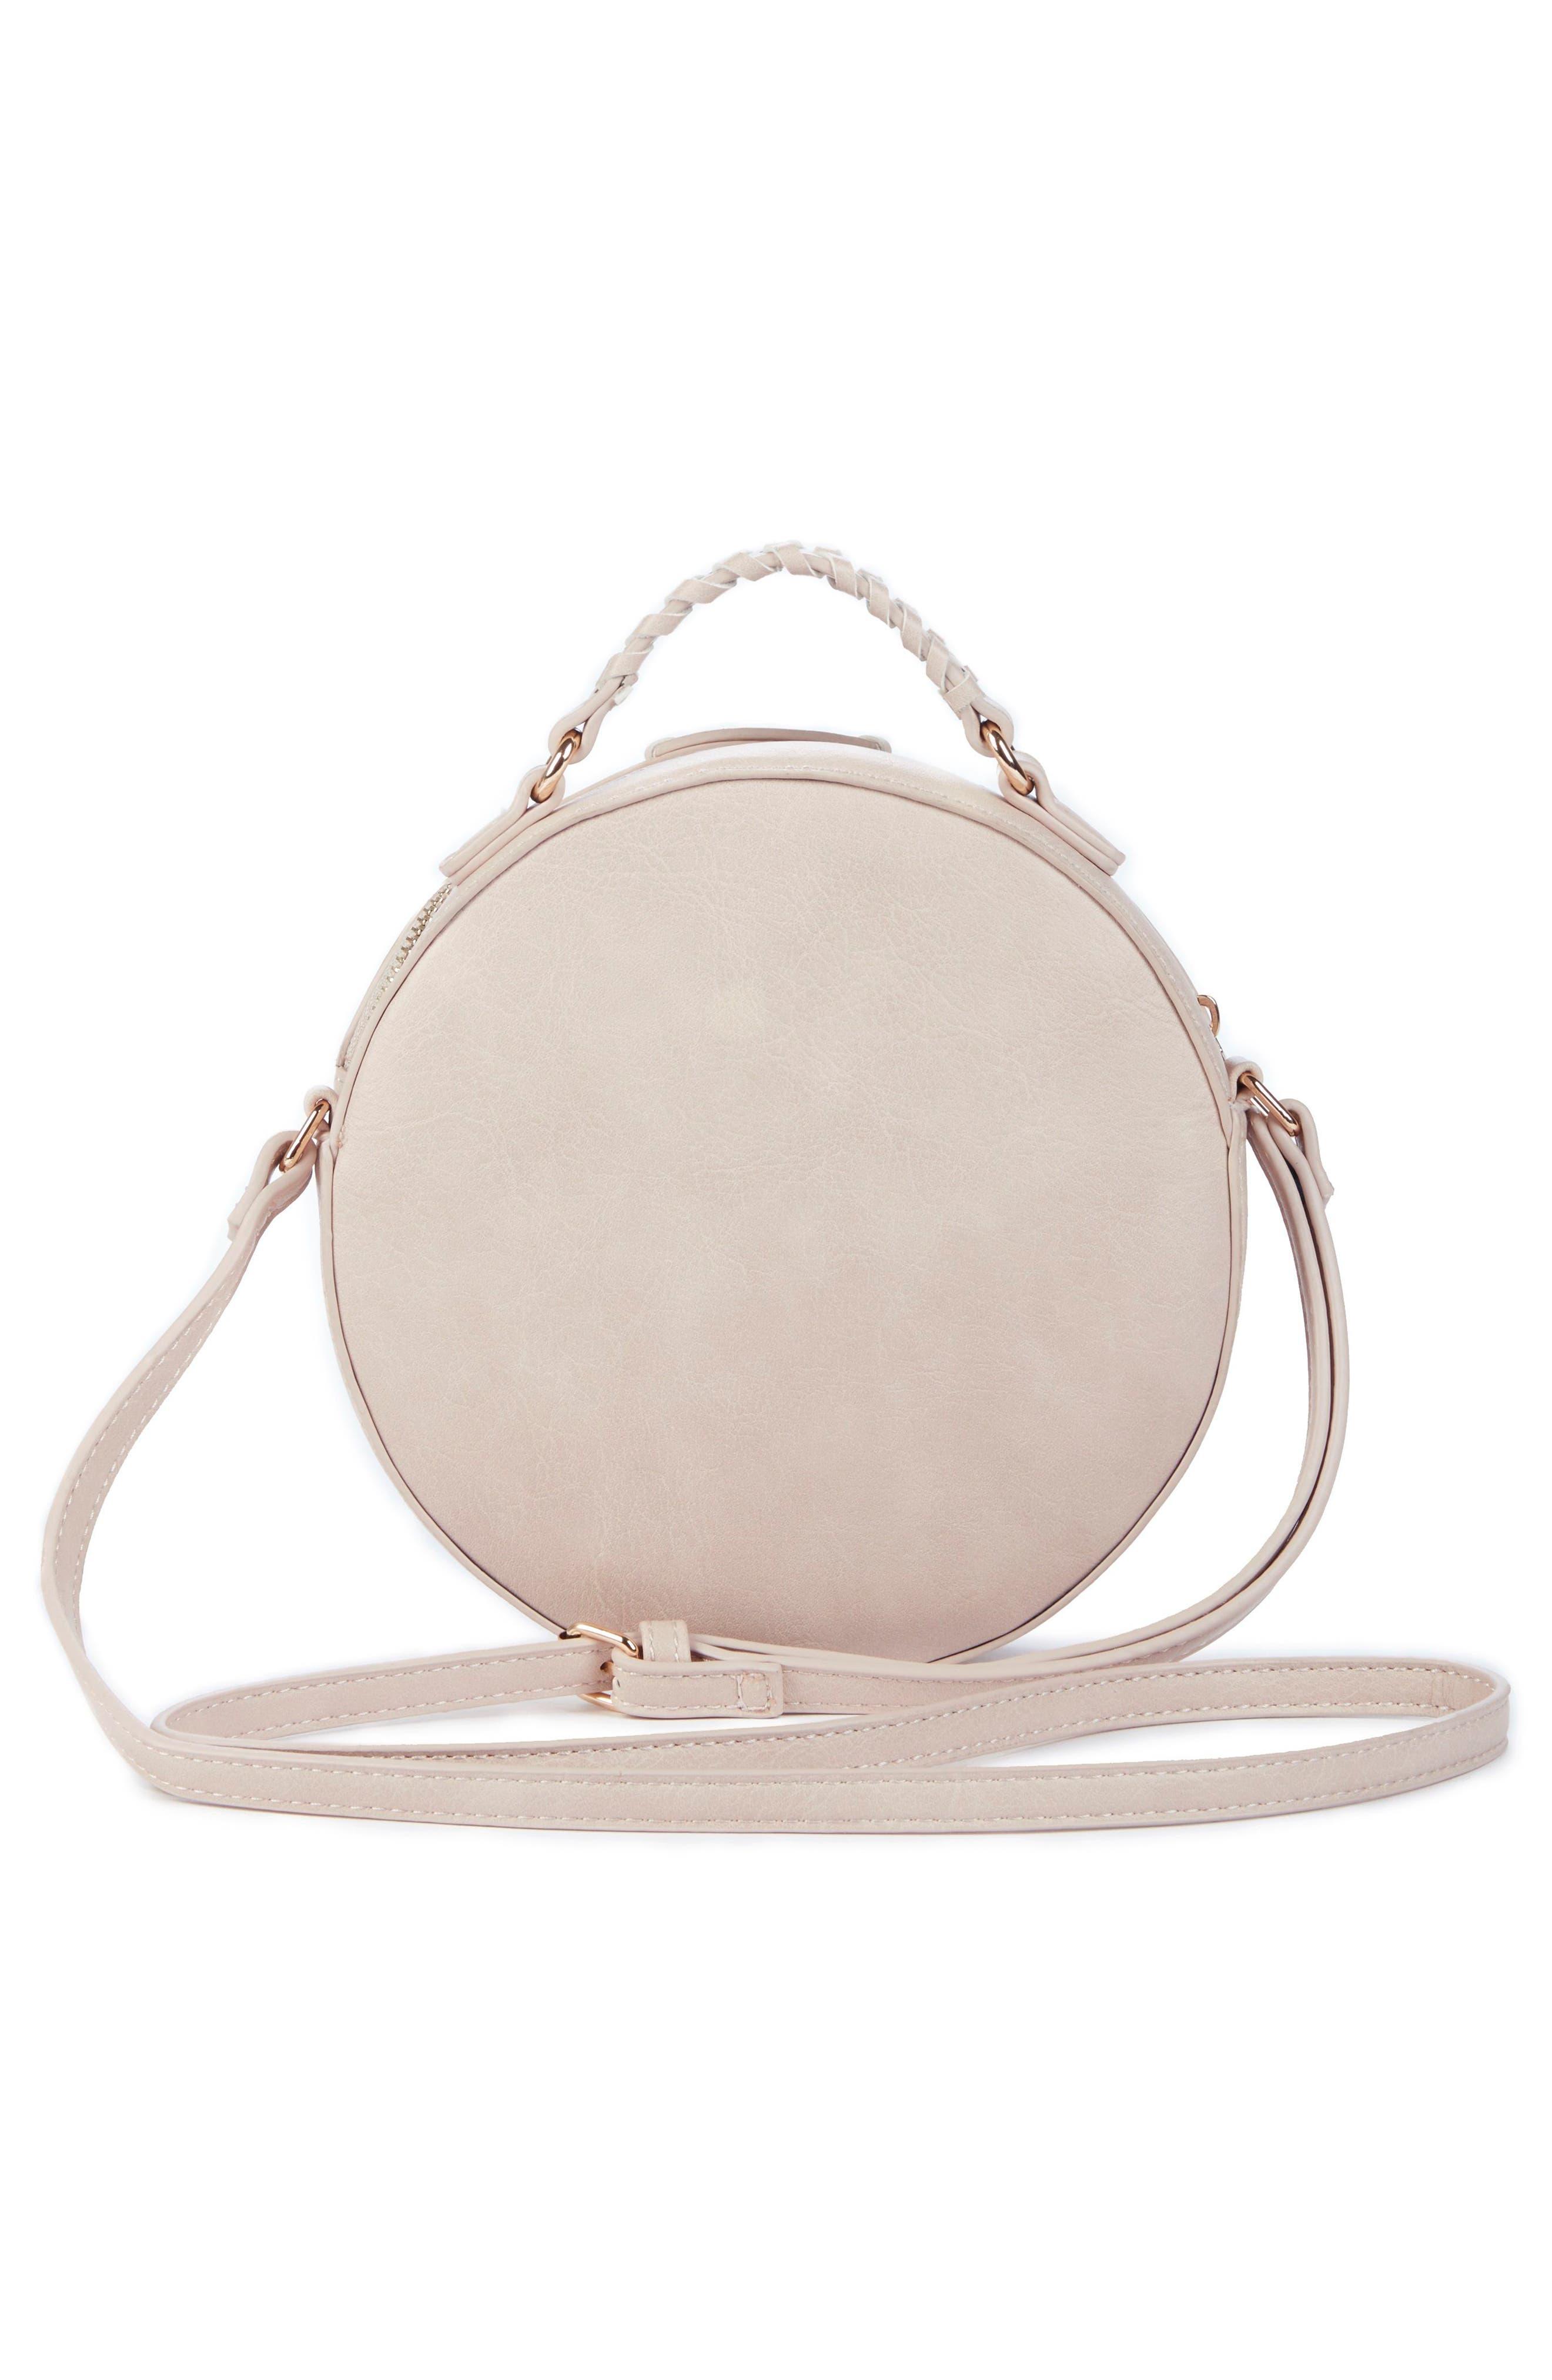 Sole Society Aerin Faux Leather Crossbody Bag